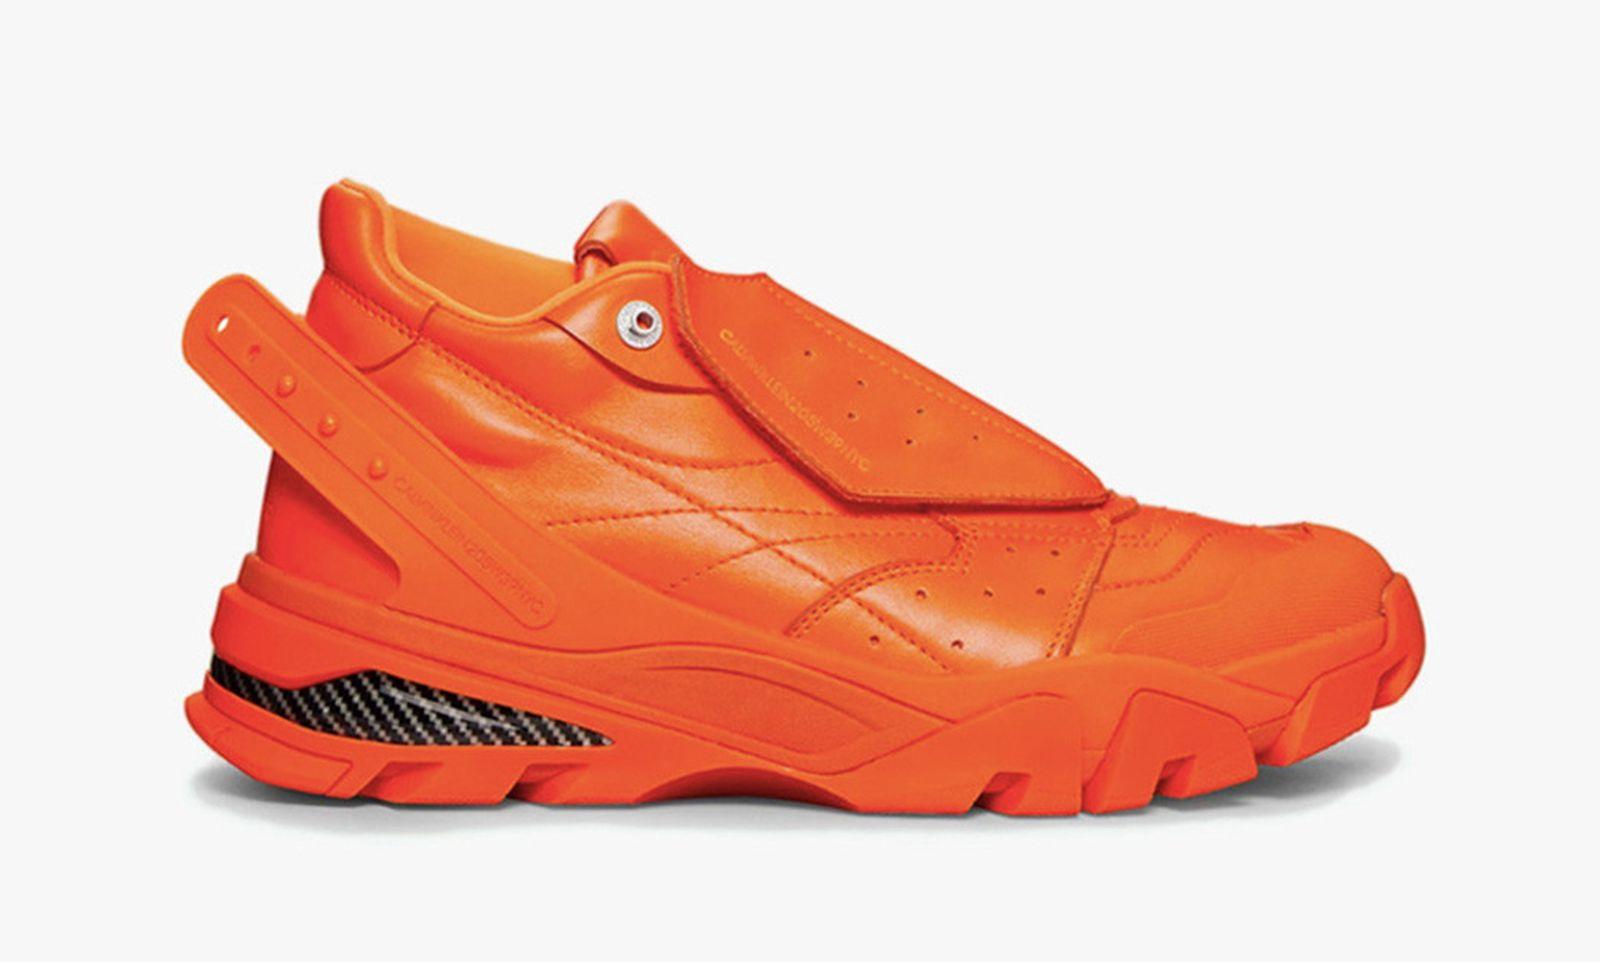 calvin klein 205w39nyc cander 7 orange release date price comments Air Jordan 19 Lil Pump Martine Rose